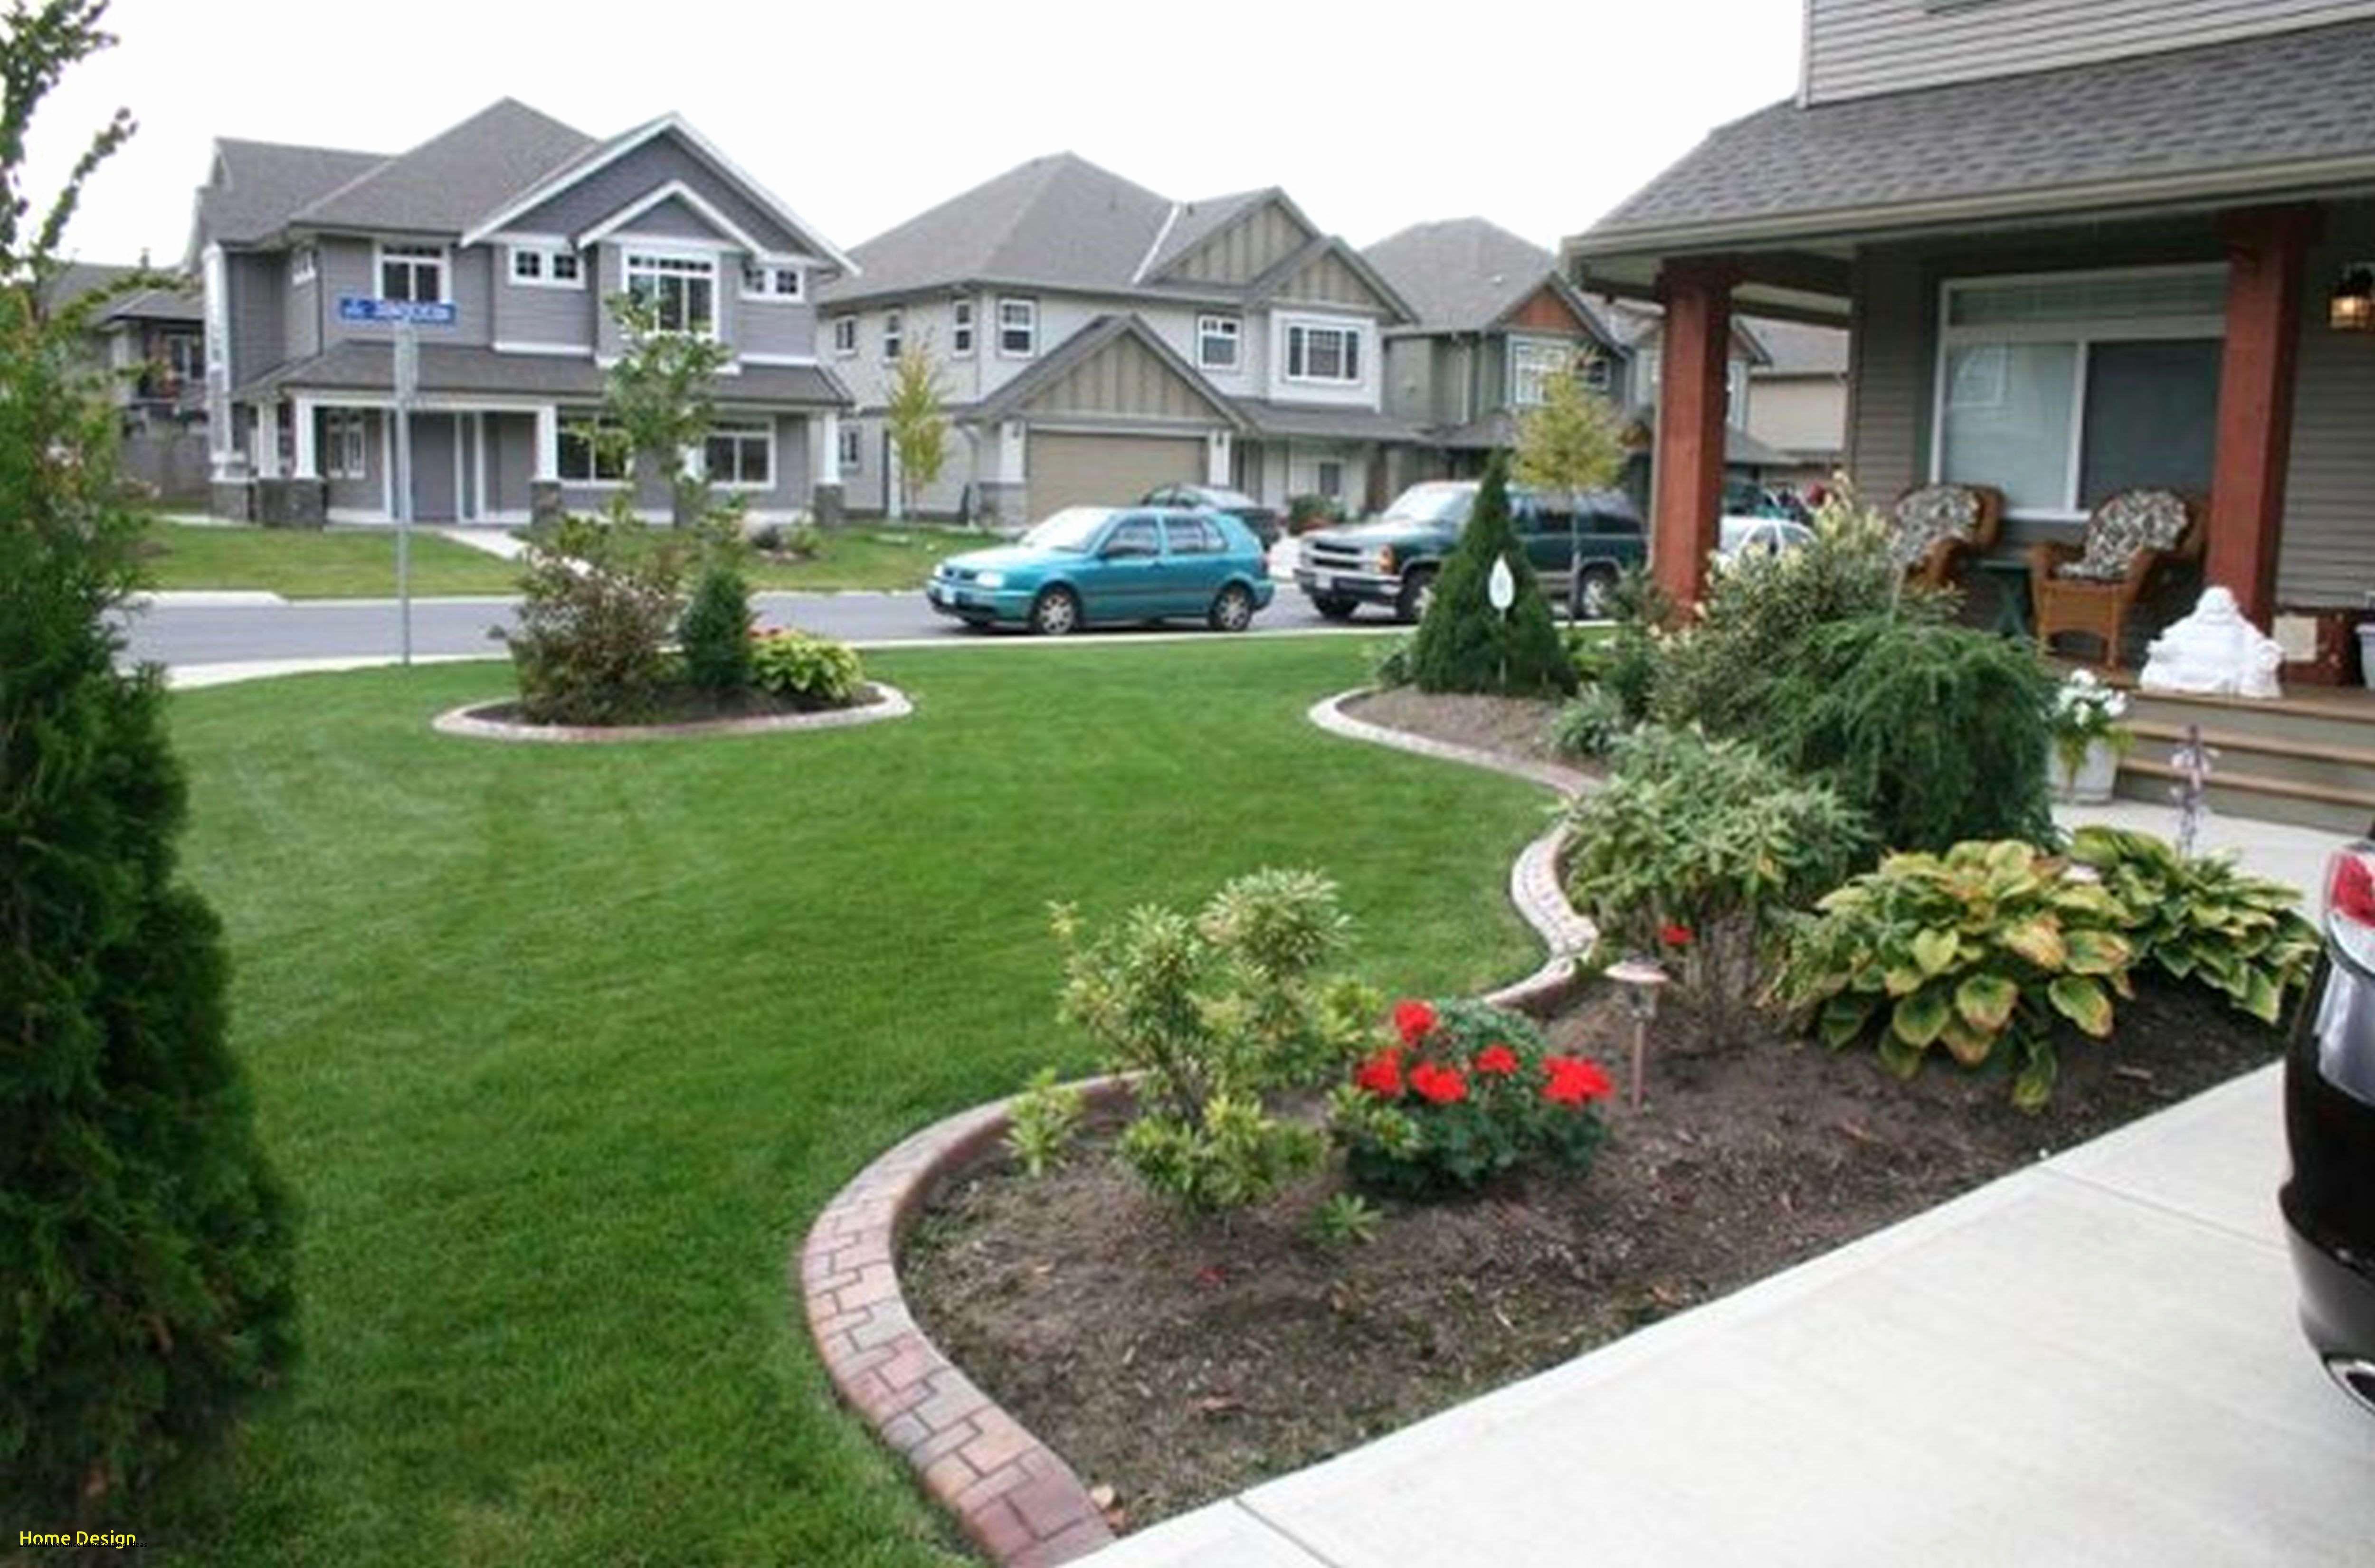 Top beautiful backyard designs also patio ideas front rh pinterest